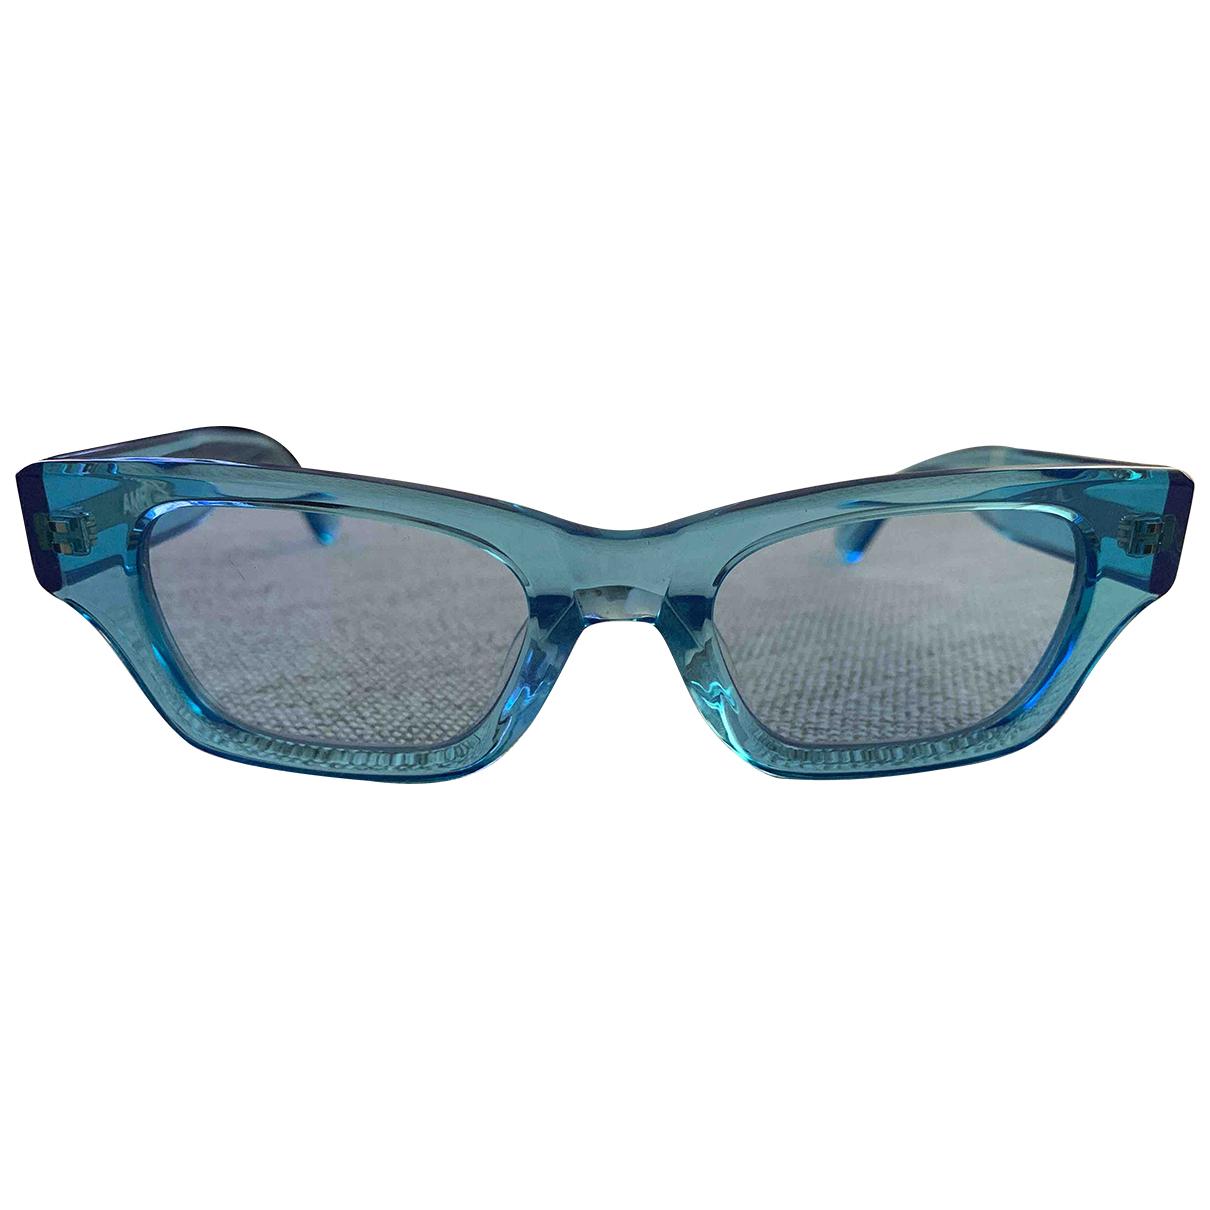 Ambush \N Turquoise Sunglasses for Women \N